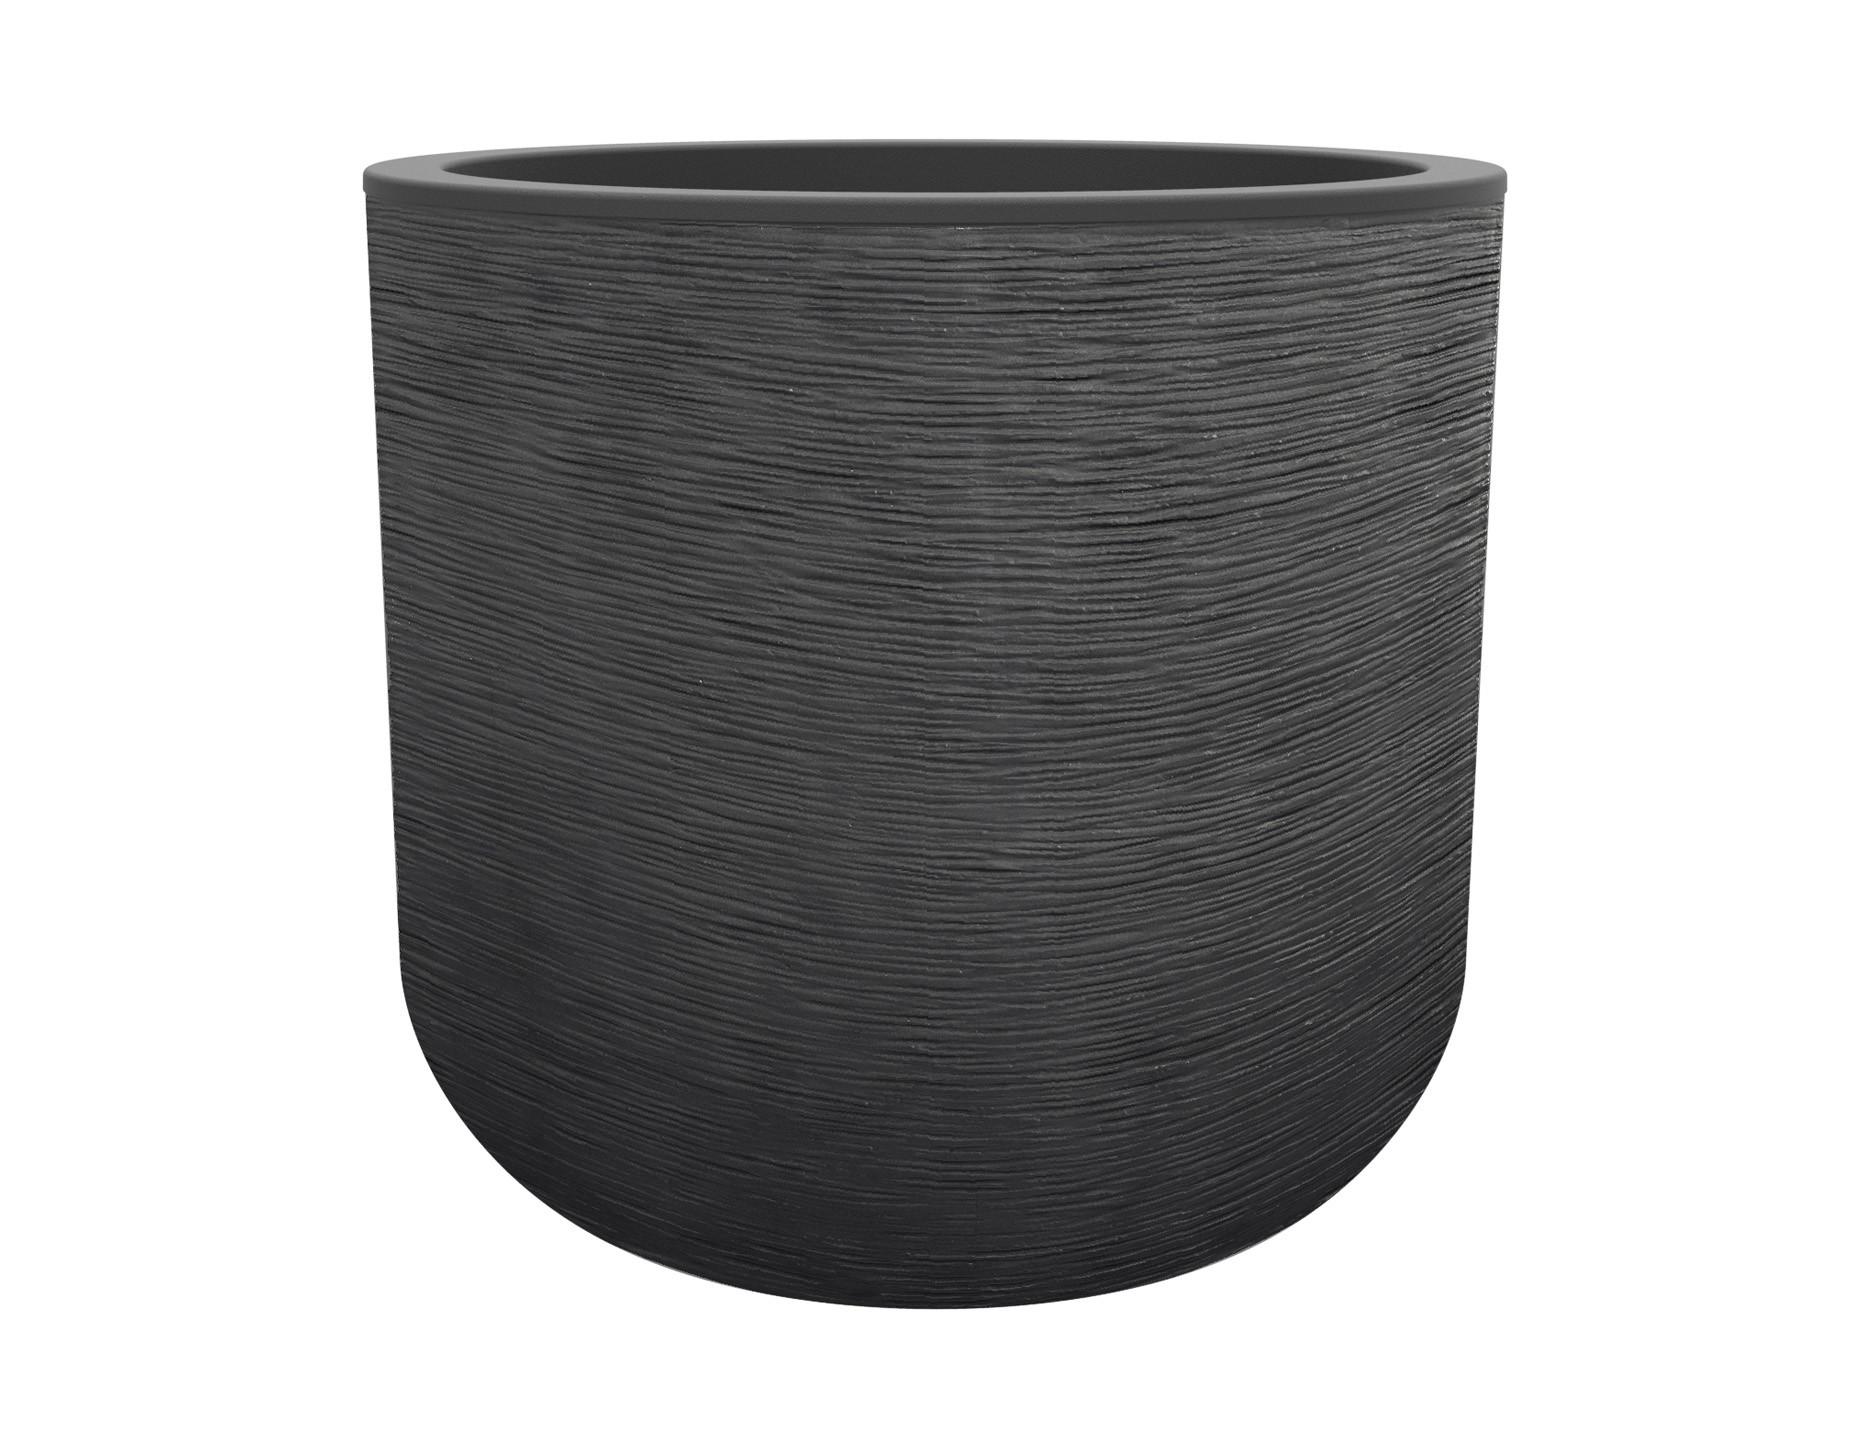 Pot rond 50cm Graphit'up anthracite